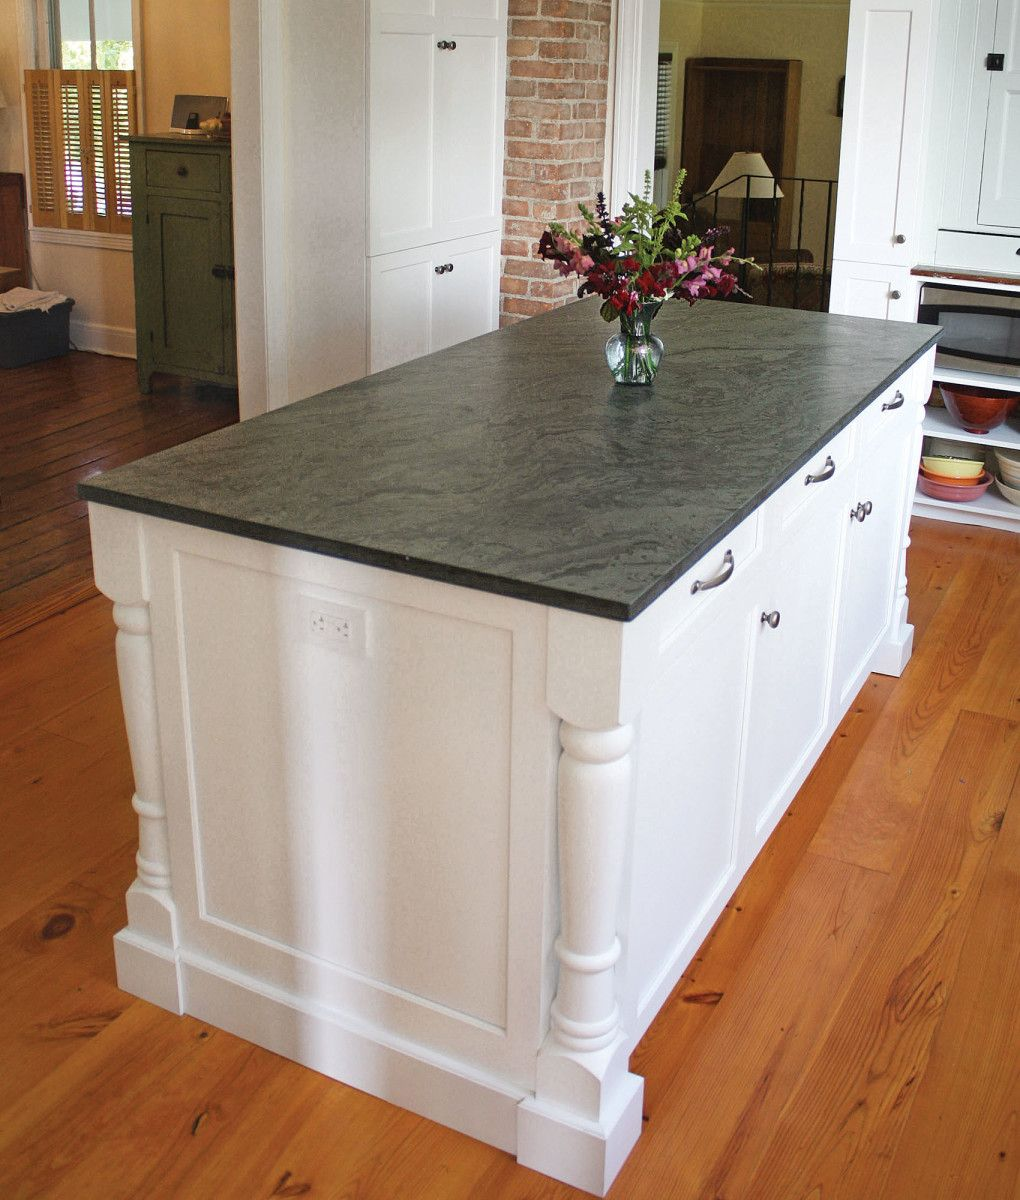 Learn More About Natural Stone Slate Countertop Countertops Wallpaper Interior Design